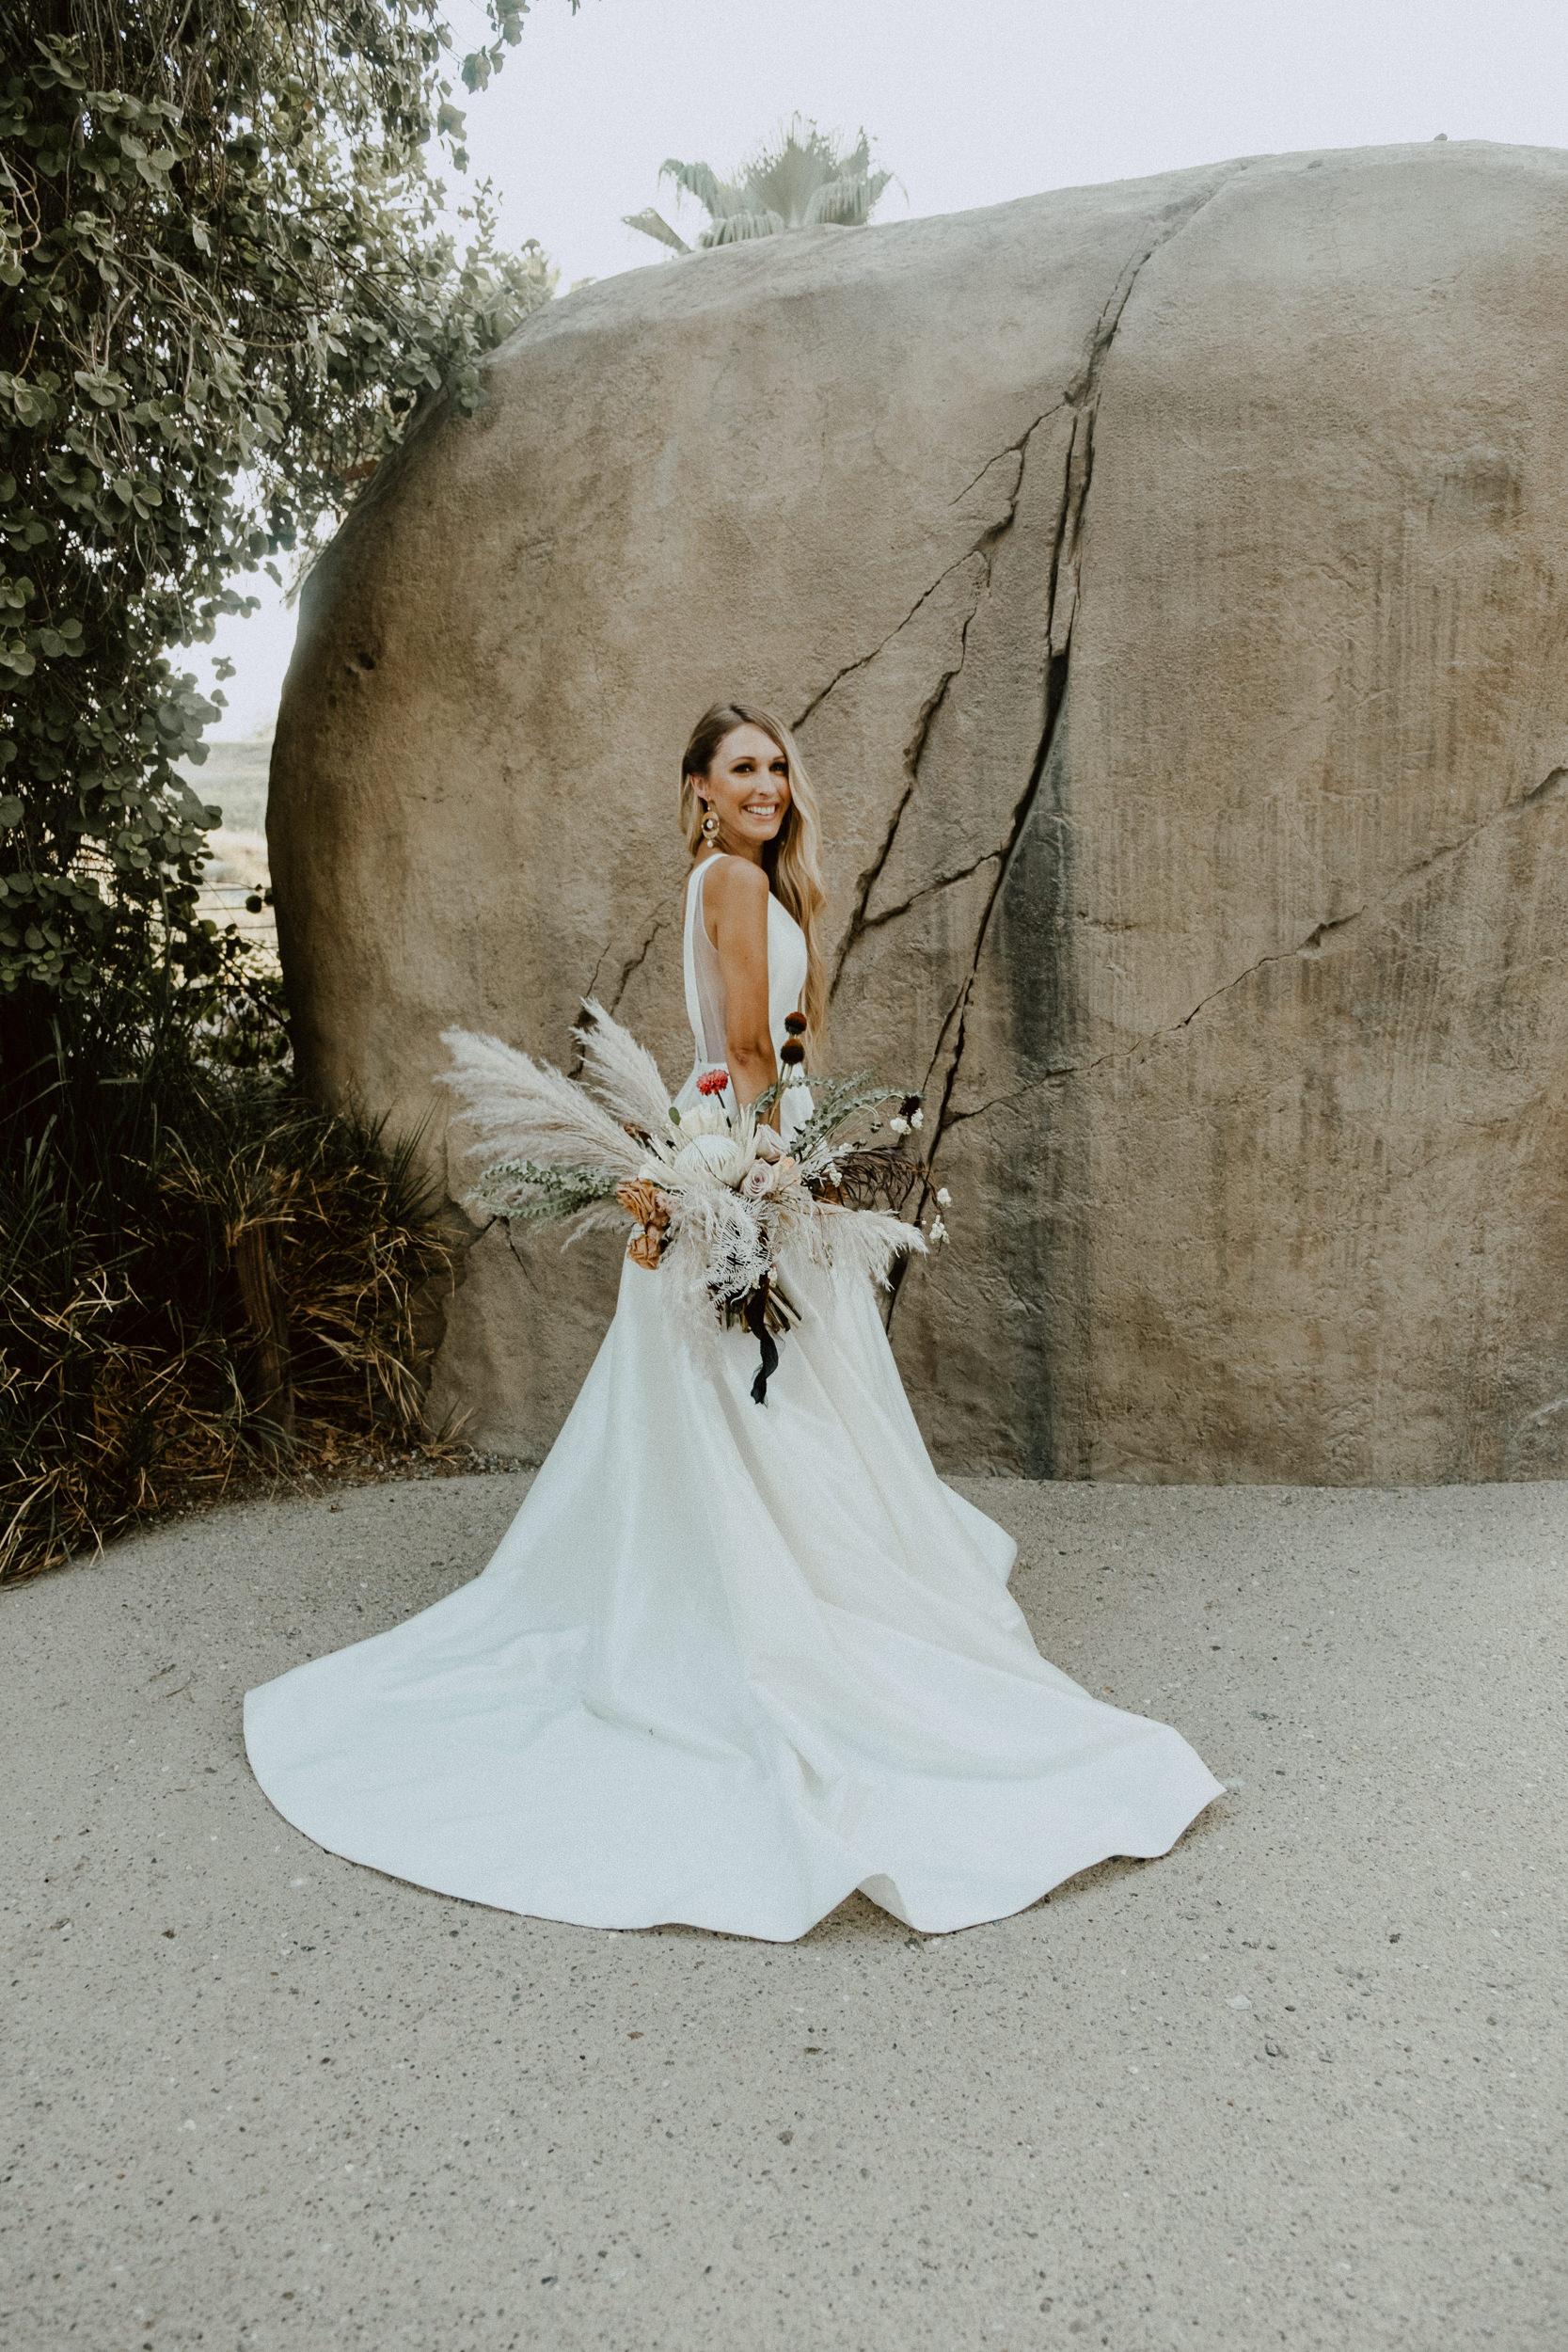 sChelsie + Chris - The Desert Shootout Wedding Romantics at The Living Desert-22.jpg